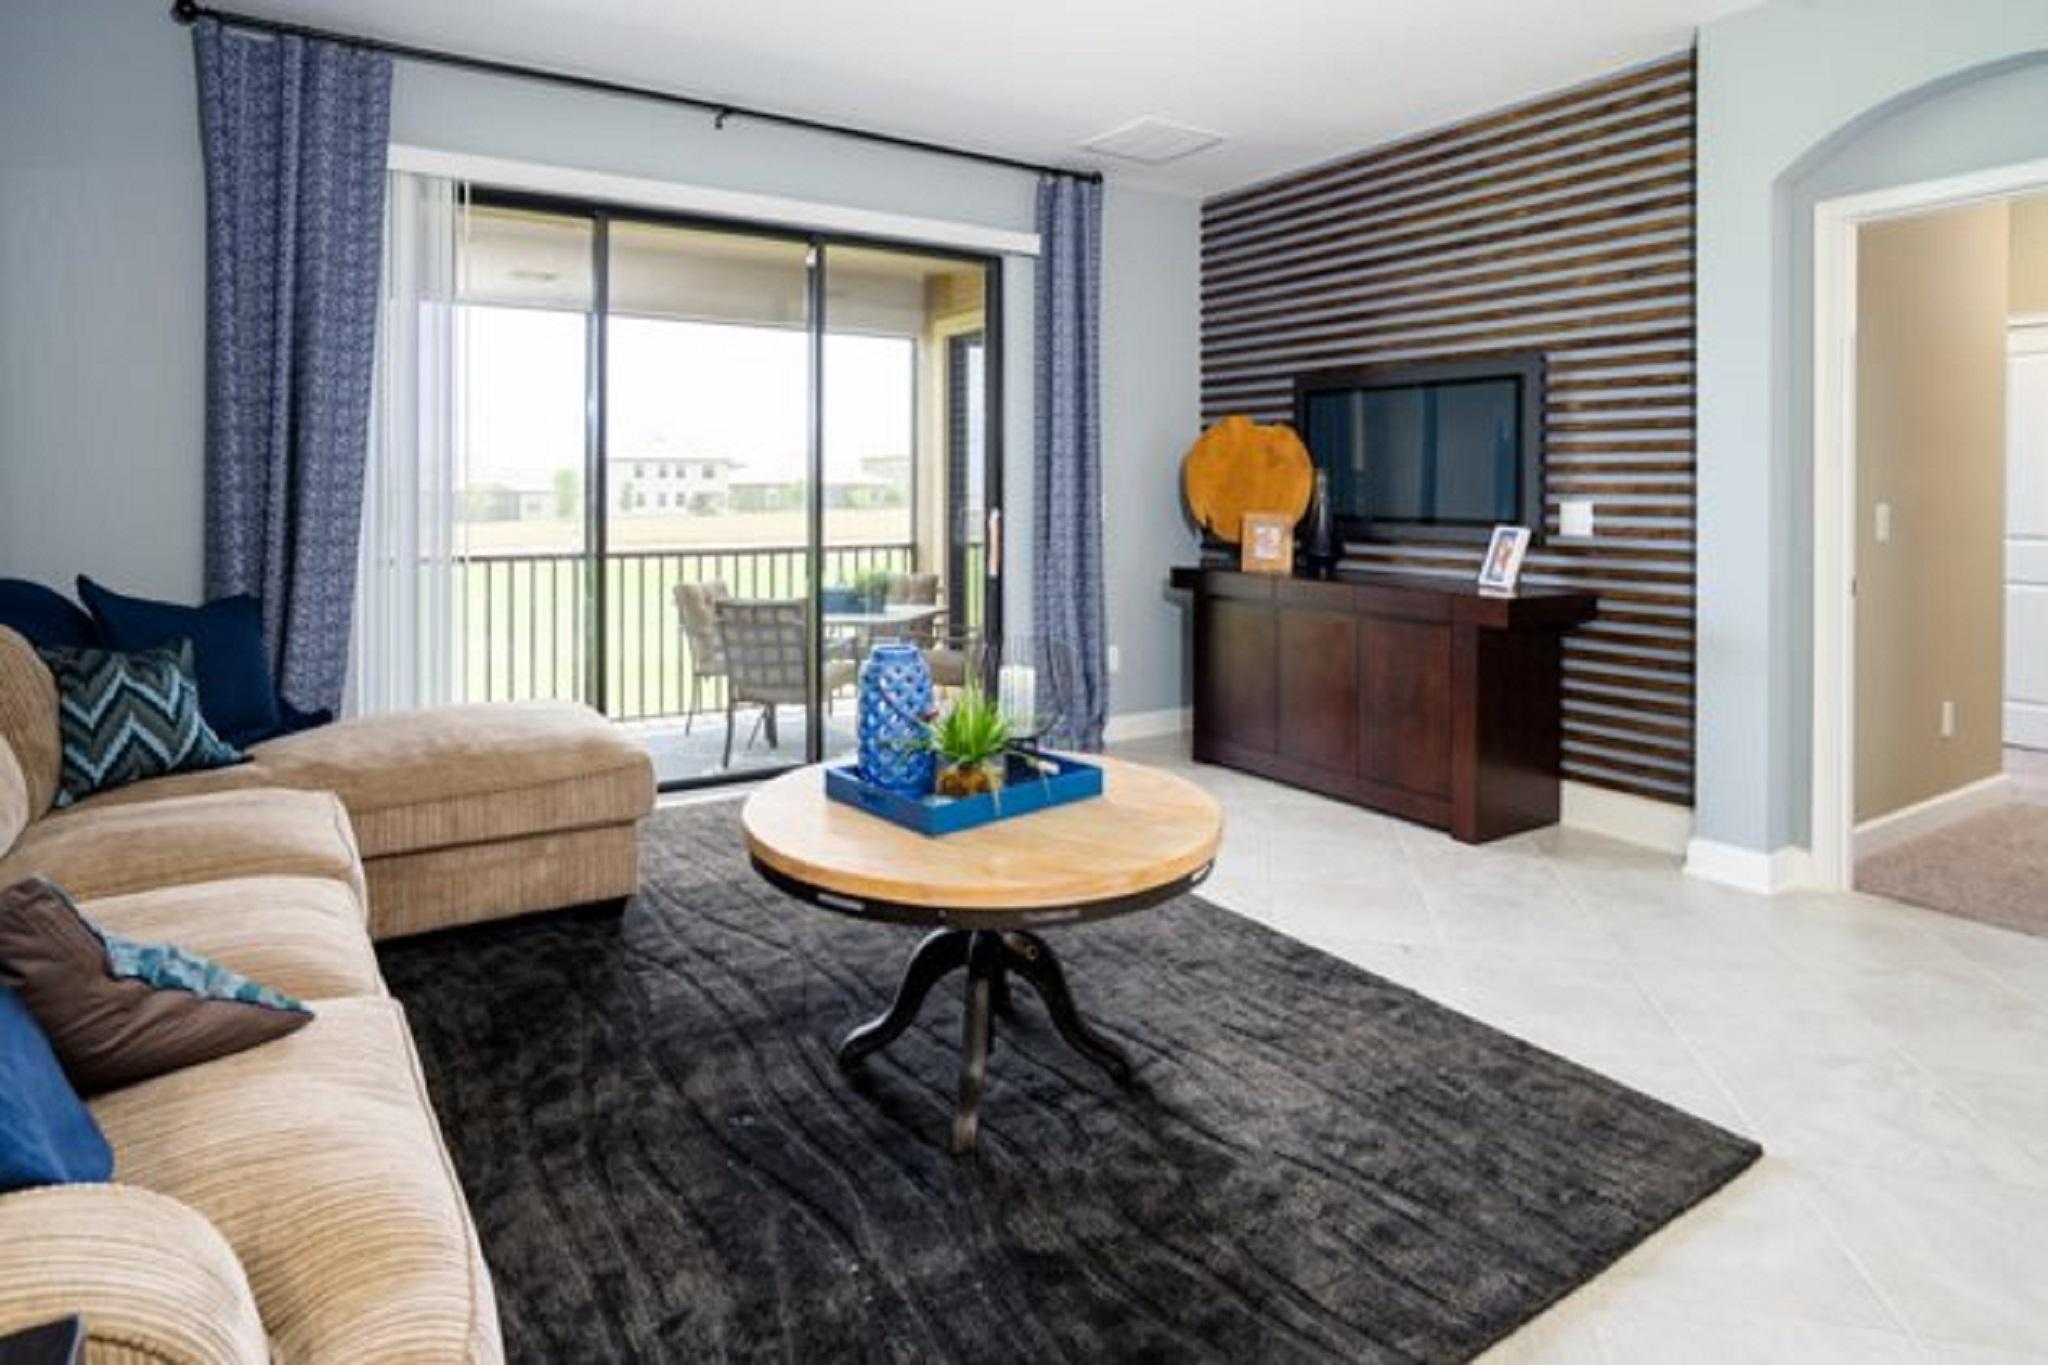 Apartment Modern 3 Bedroom Condo At Champions Gate  Orlando  photo 24737668